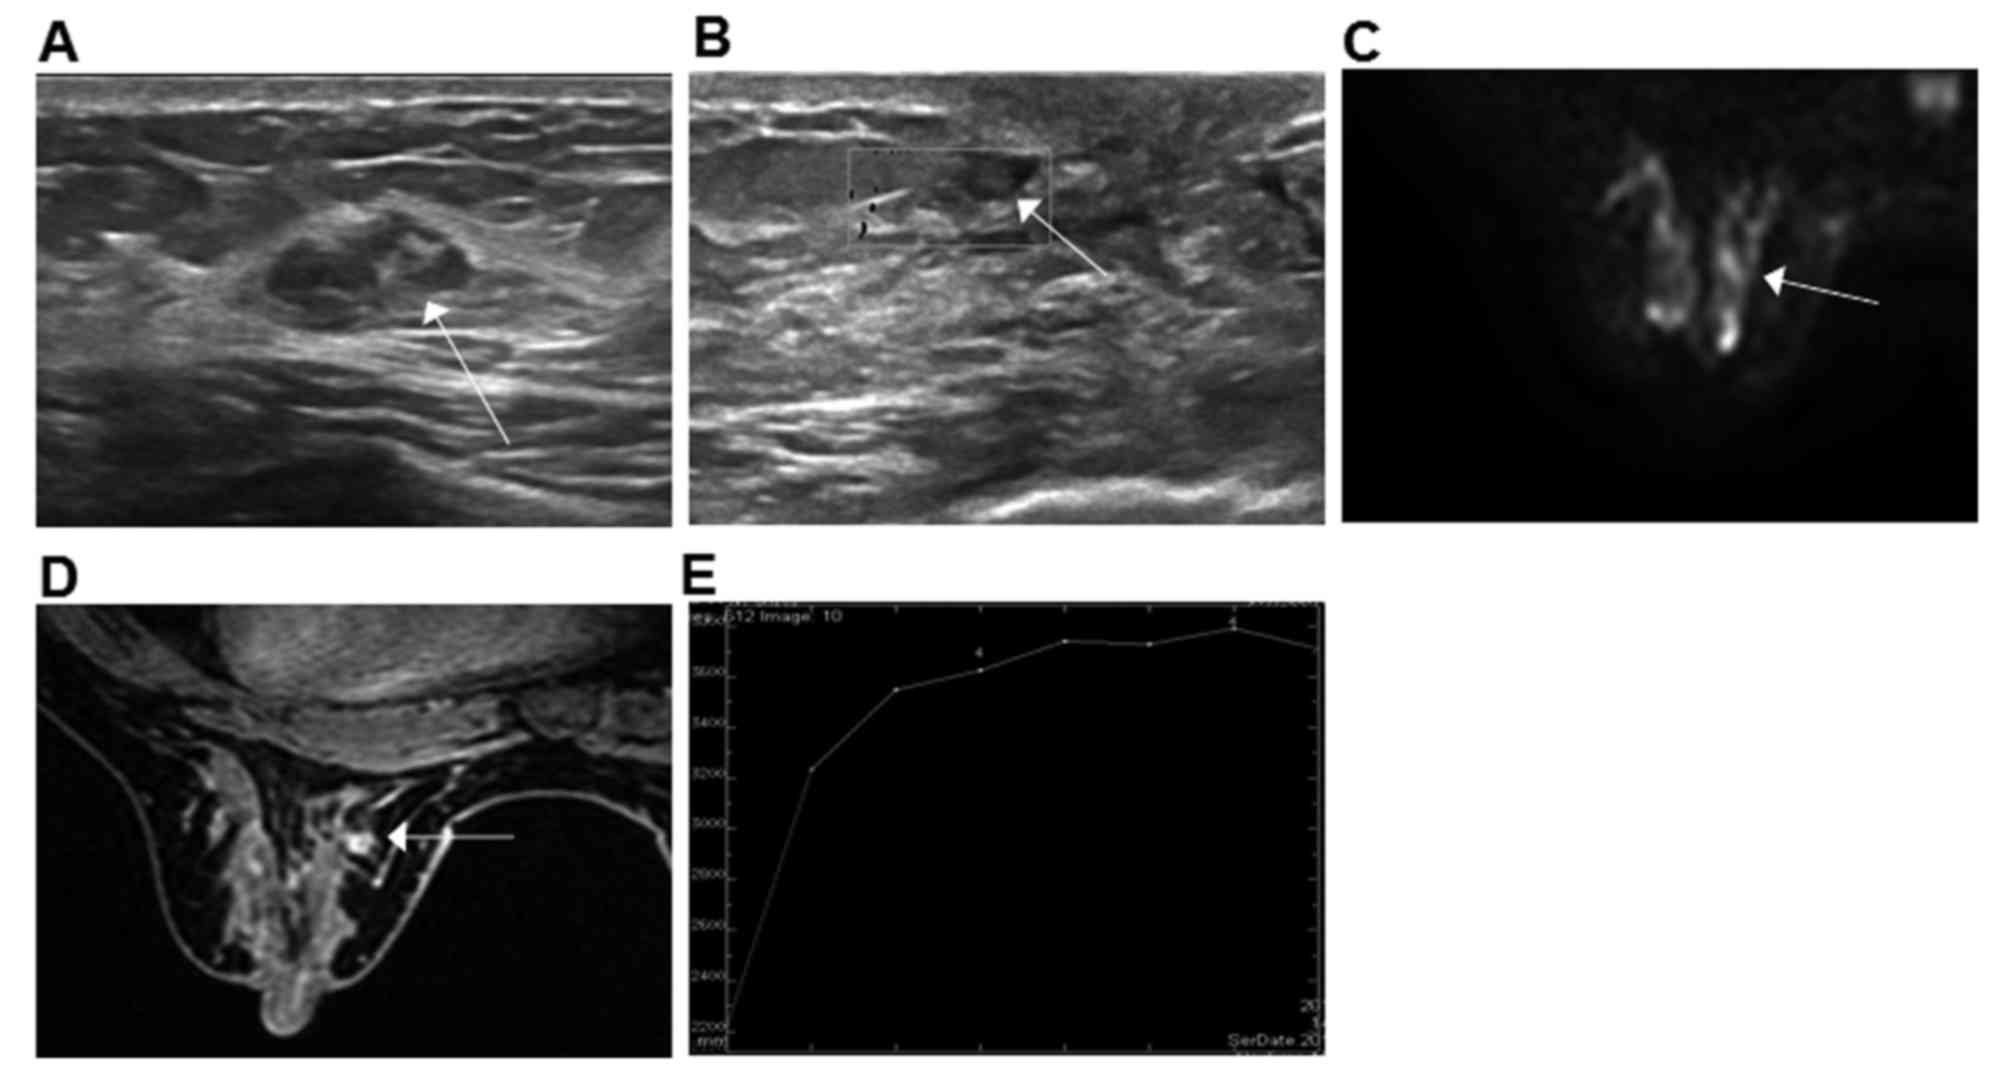 intraductal papilloma mri breast